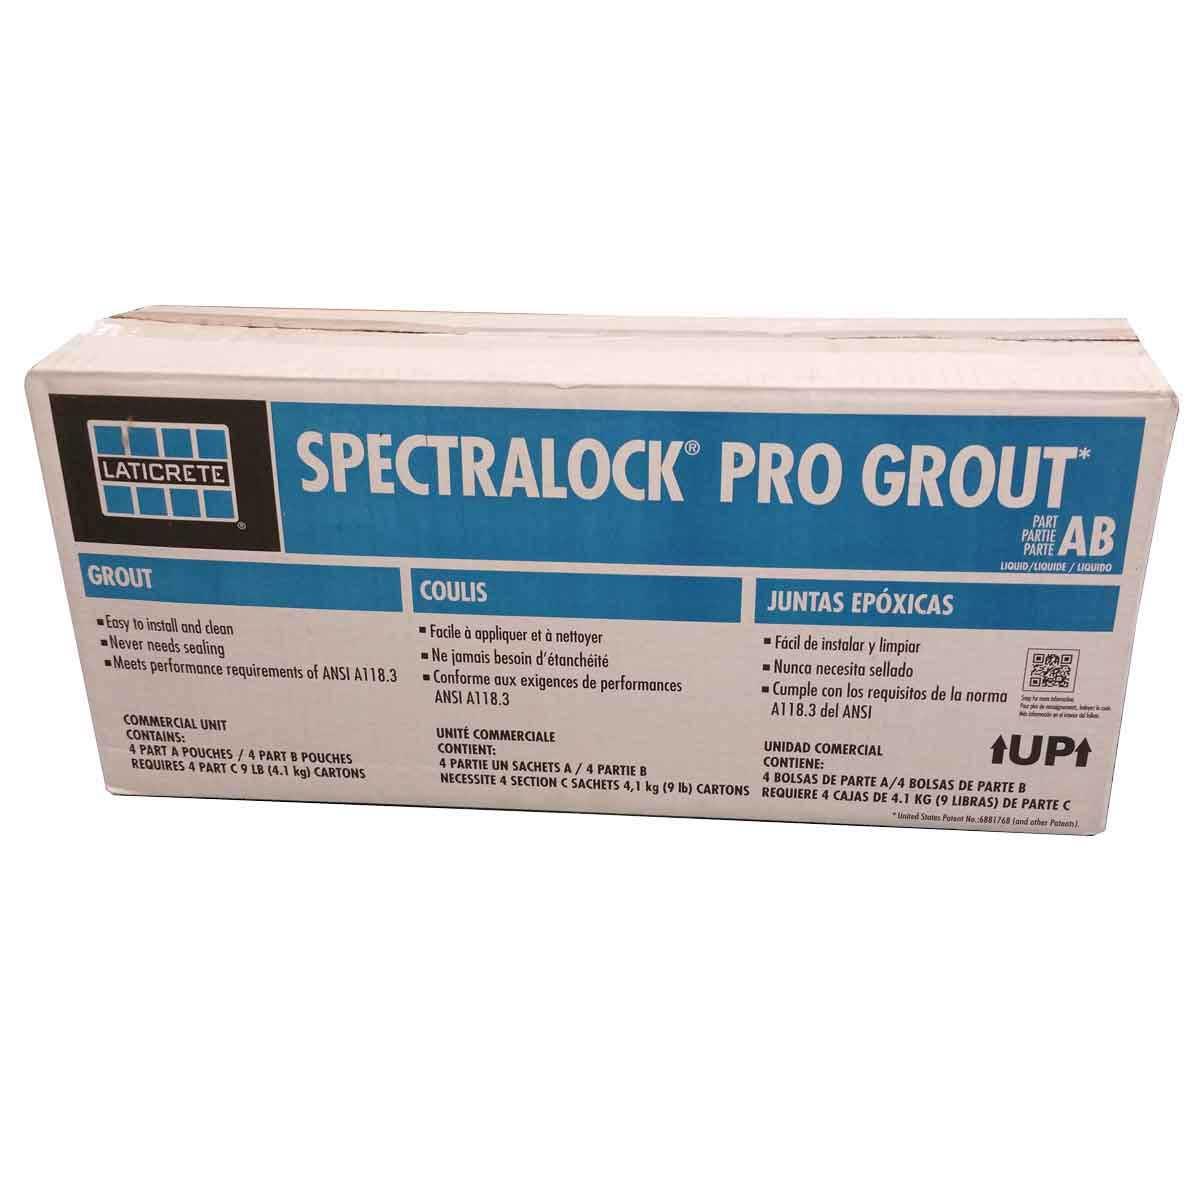 spectralock pro grout AB